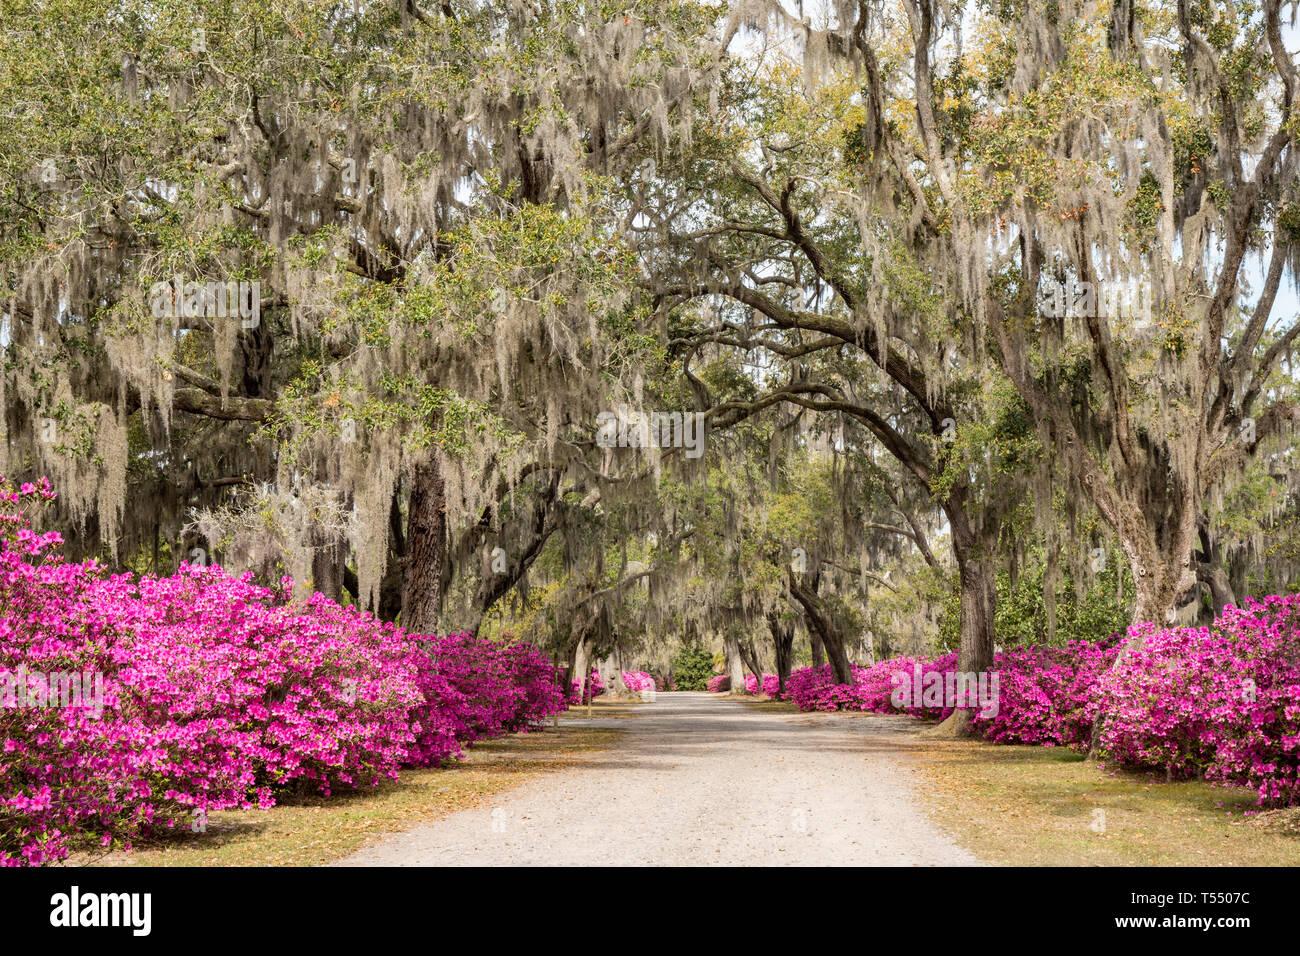 Azalea flowers in full bloom along the avenue of oaks in Bonaventure Cemetery in Savannah, Georgia - Stock Image